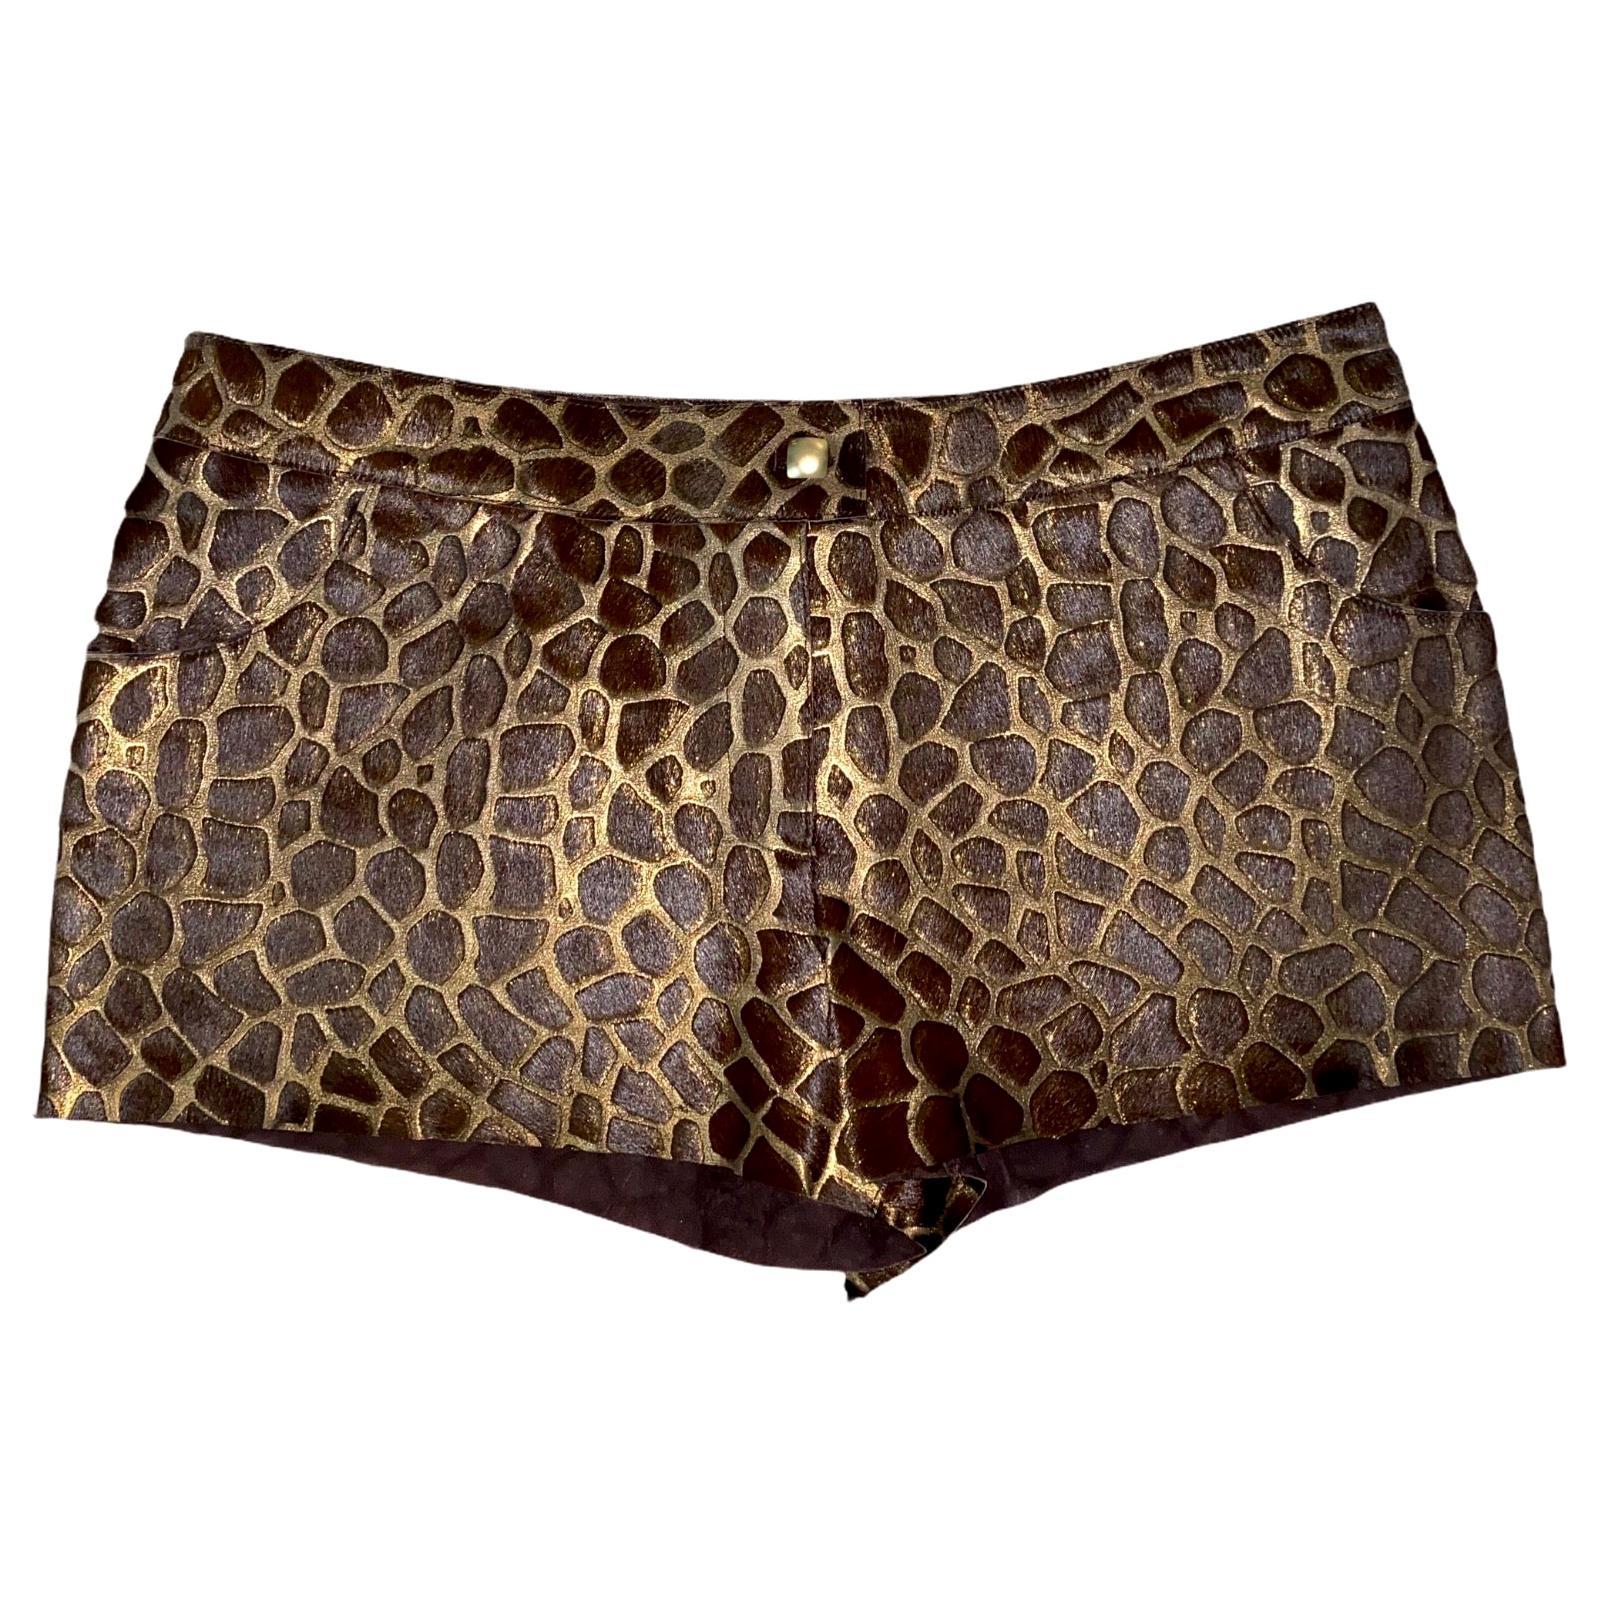 NEW Chanel Metallic Leather and Fur Giraffe Animal Print Safari Hot Pants Shorts